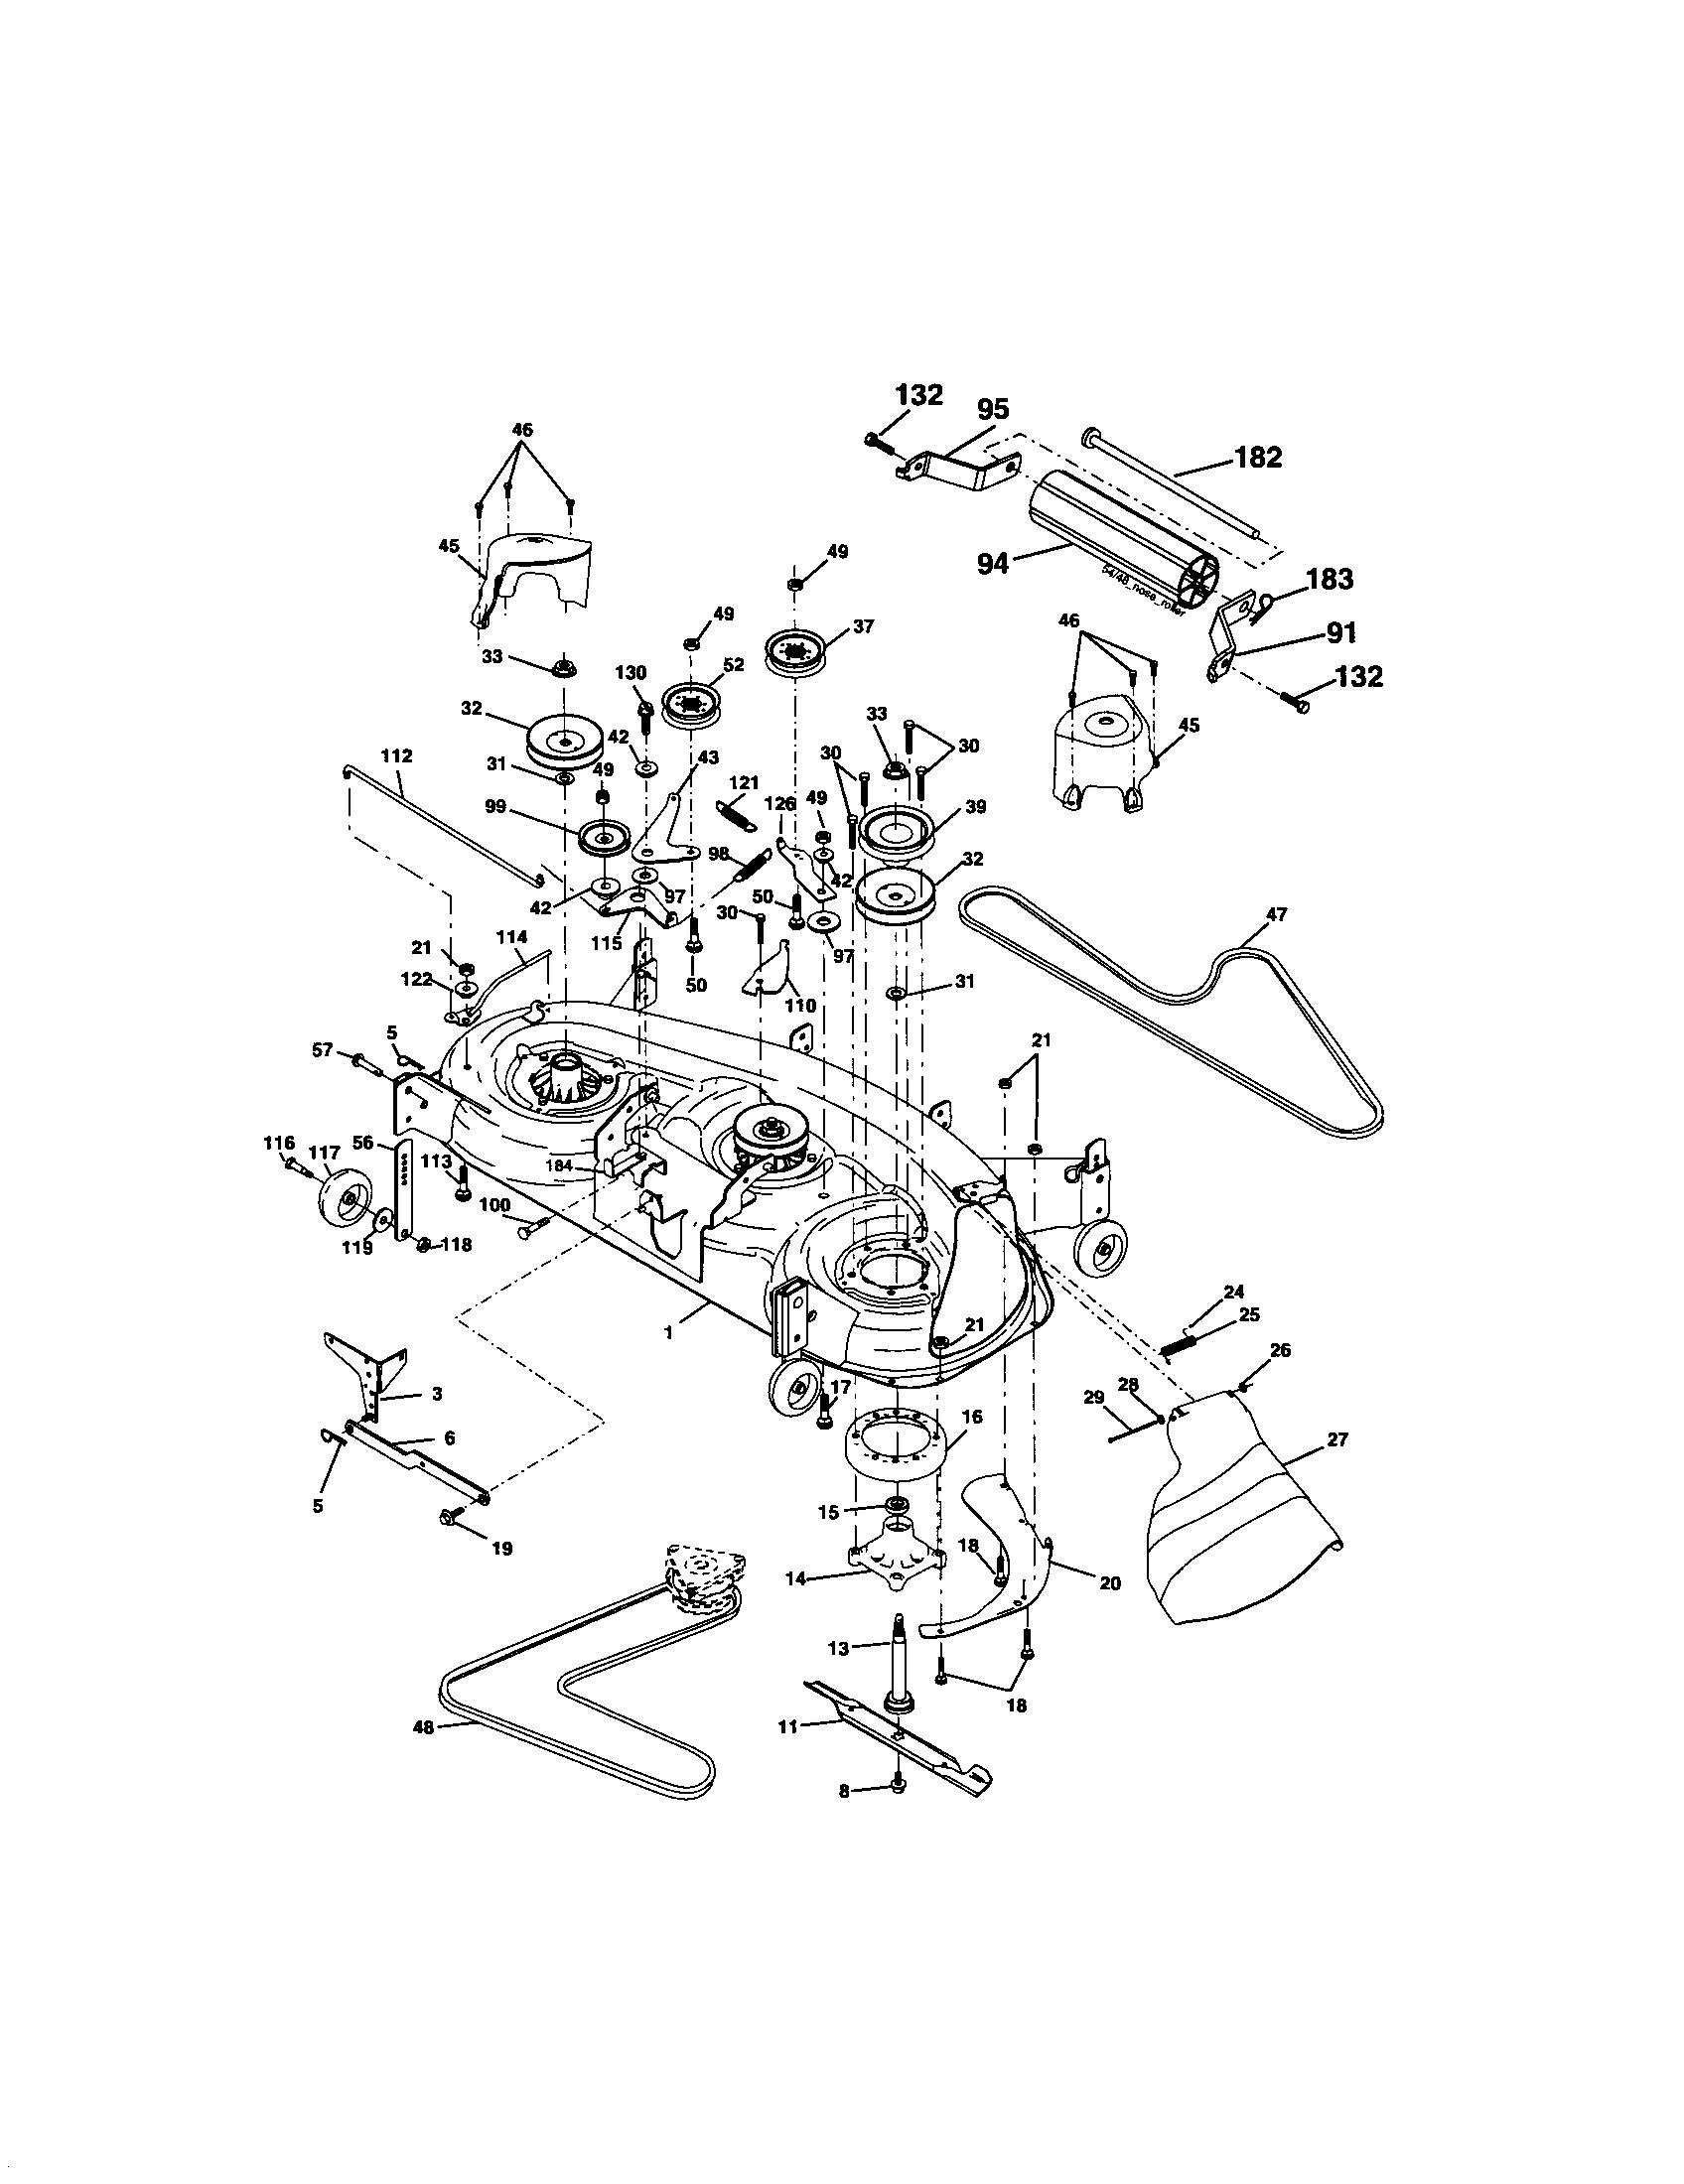 hight resolution of craftsman gt 5000 garden tractor part